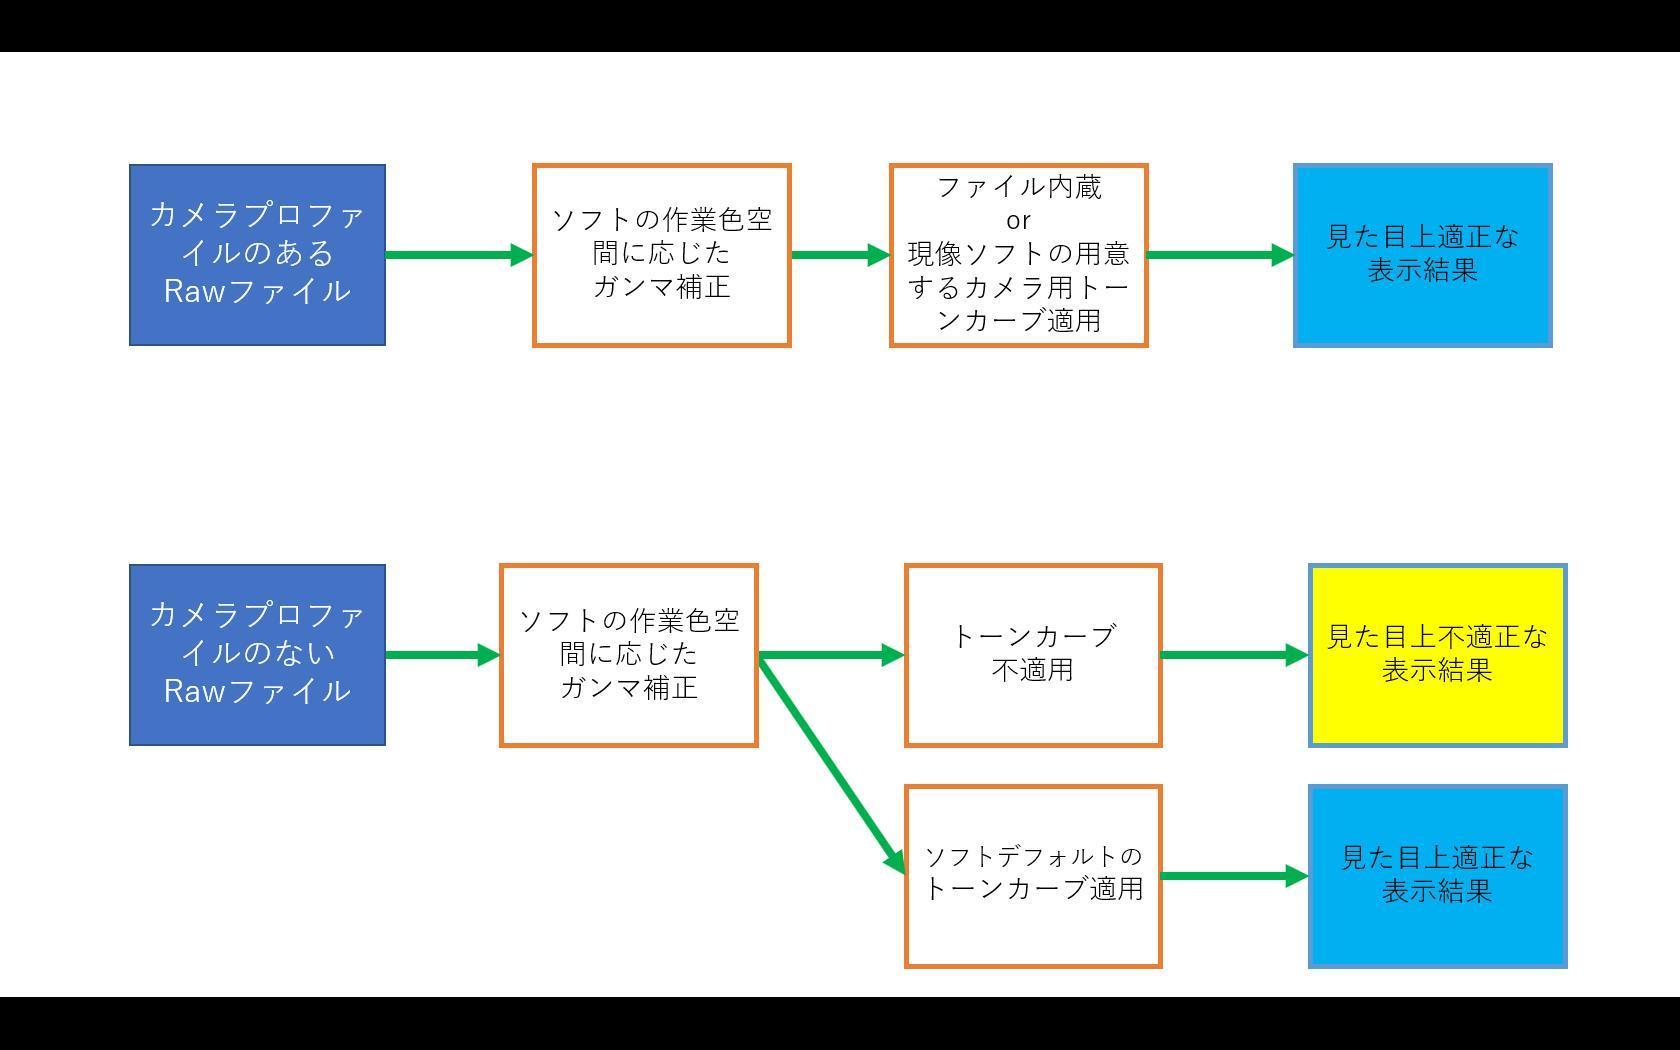 f:id:yasuo_ssi:20201110090152j:plain